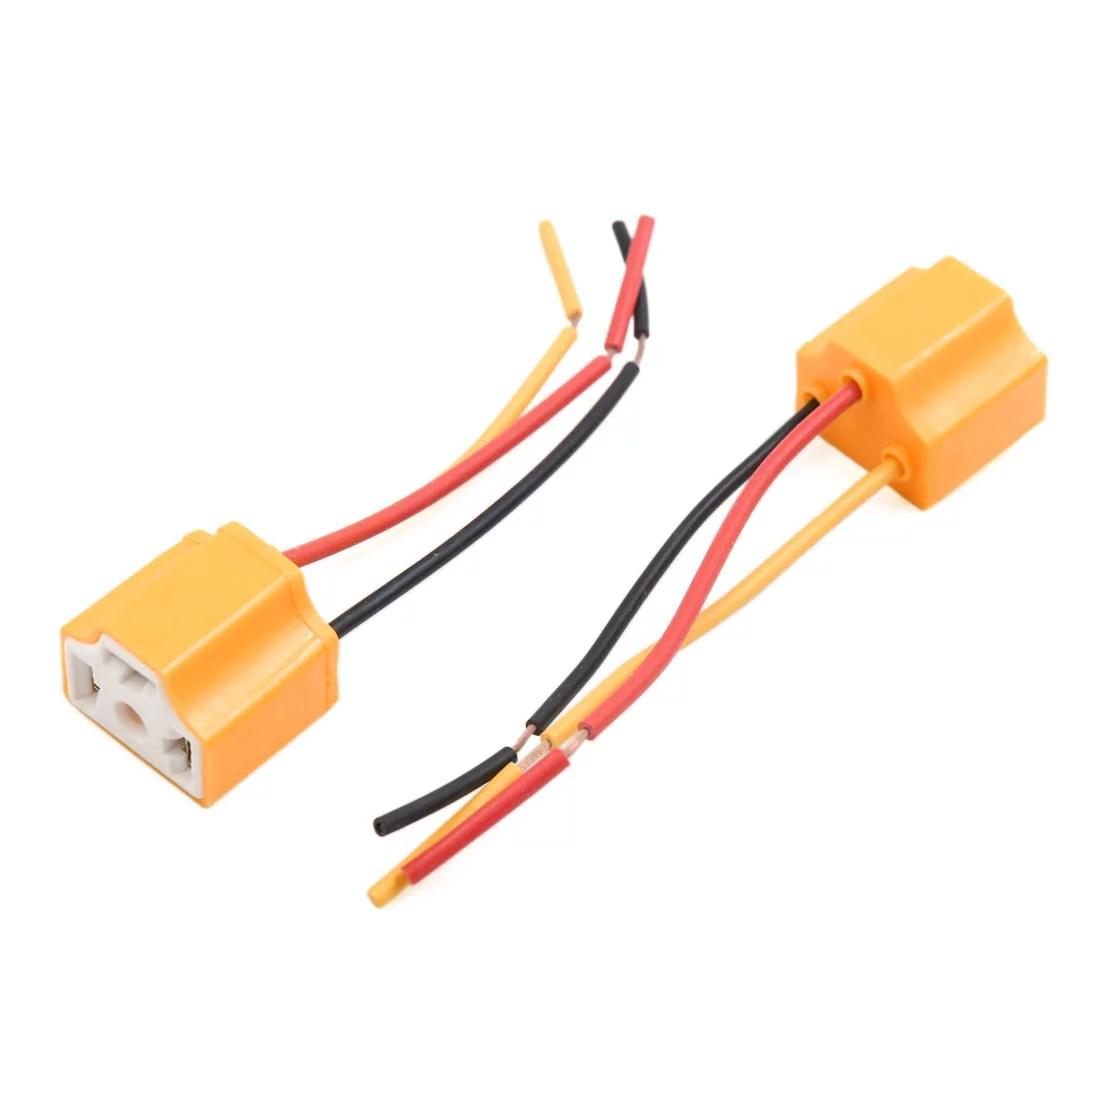 10 pcs orange 3 terminals h4 bulb socket car wire harness extension [ 1100 x 1100 Pixel ]